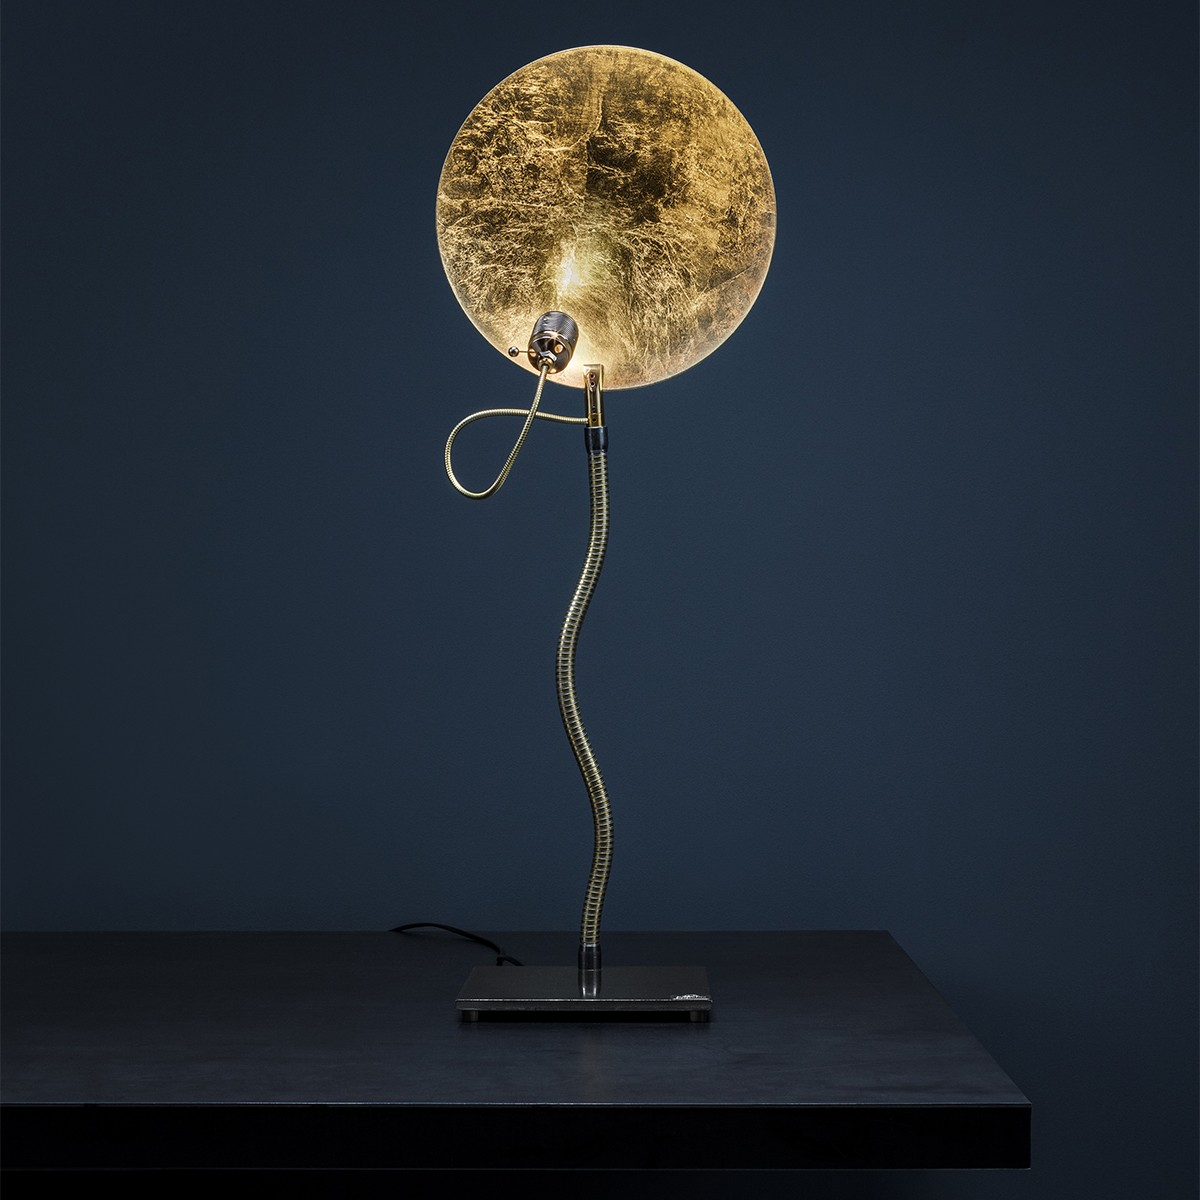 Catellani & Smith Luce d'Oro T Tischleuchte, Ø: 30 cm, Gold